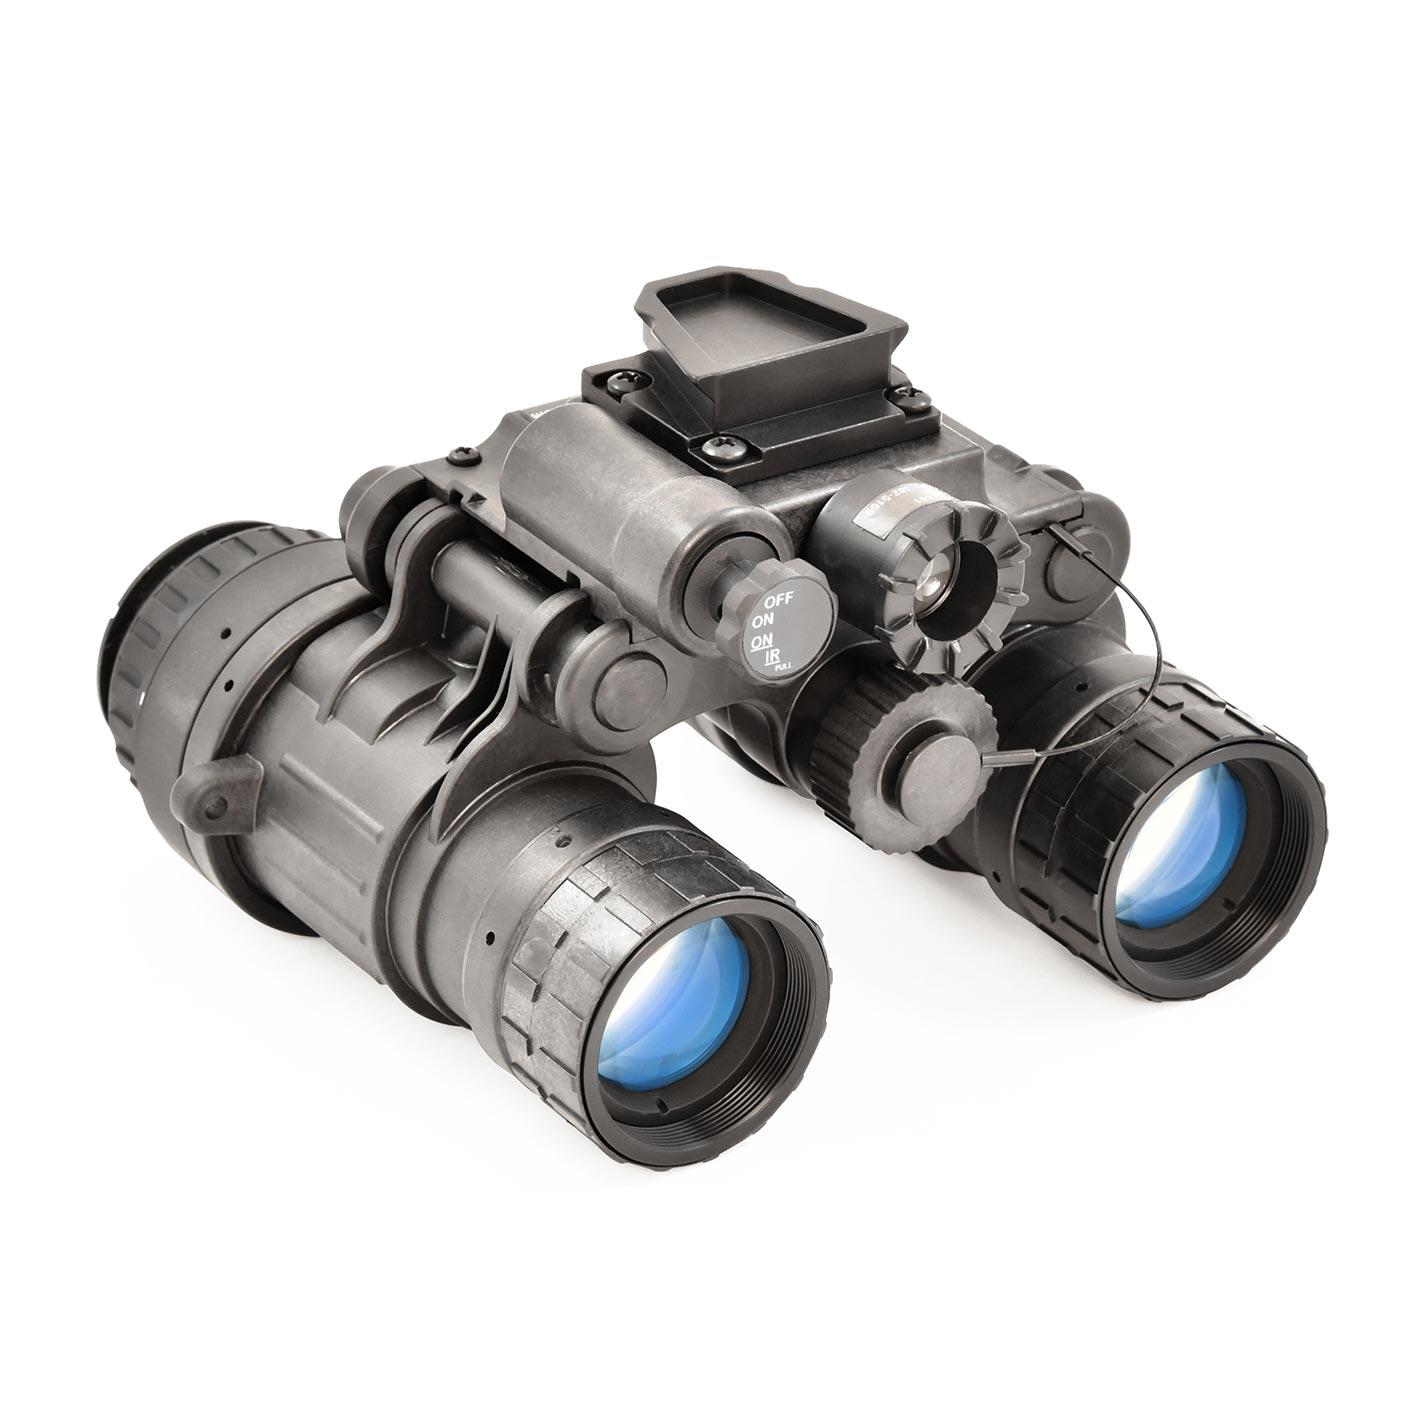 BNVD Night Vision Binocular - No Gain